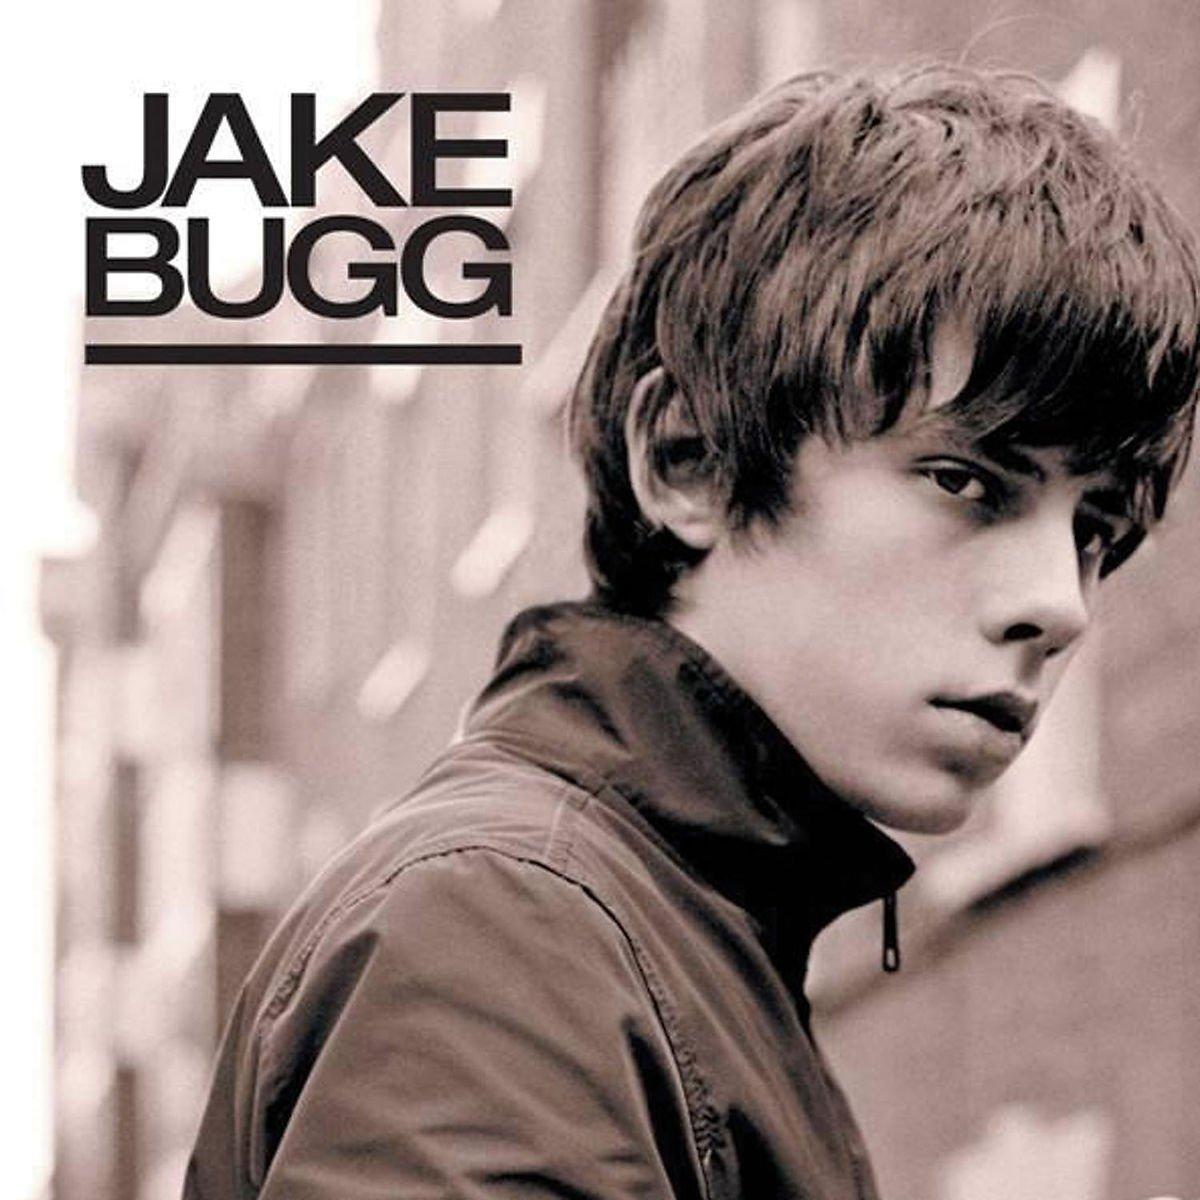 Vinilo : Jake Bugg - Jake Bugg (LP Vinyl)